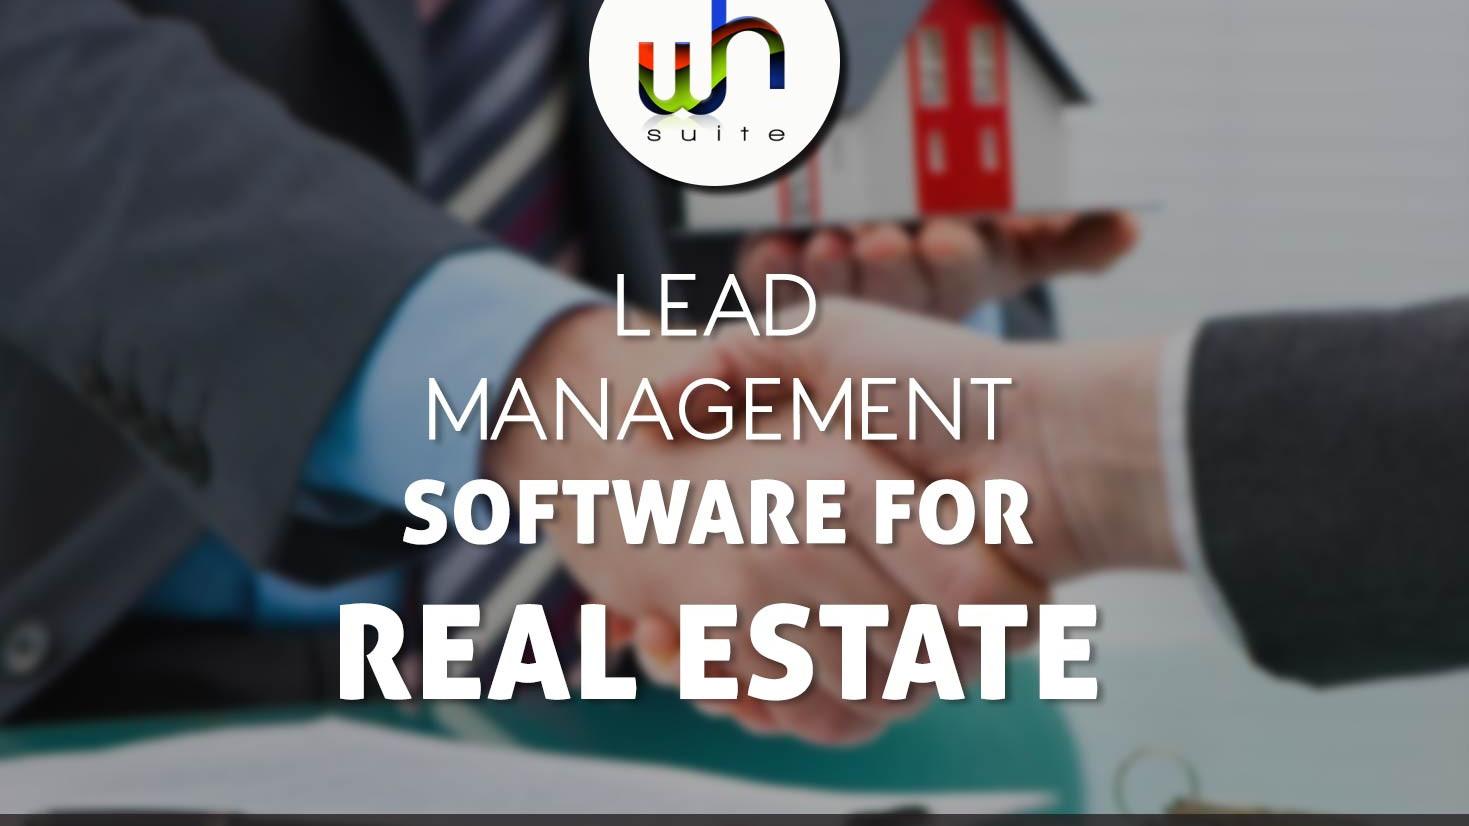 real estate lead management software